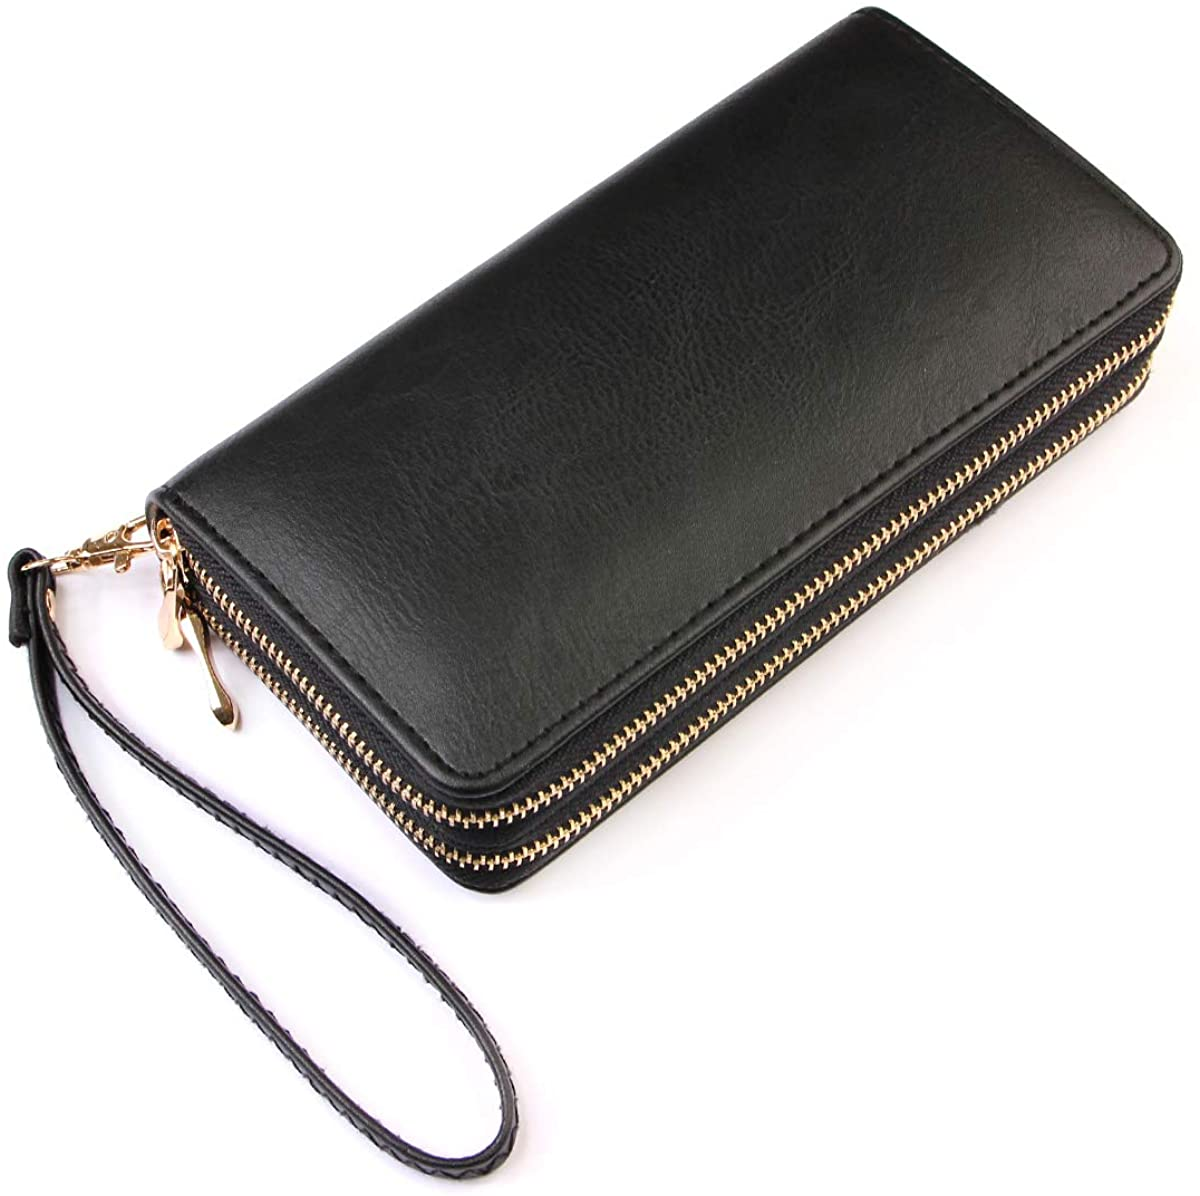 Classic Leatherette Zip Around Wallet - Vegan Leather Zipper Clutch Purse Coin Card Slots, Removable Wristlet